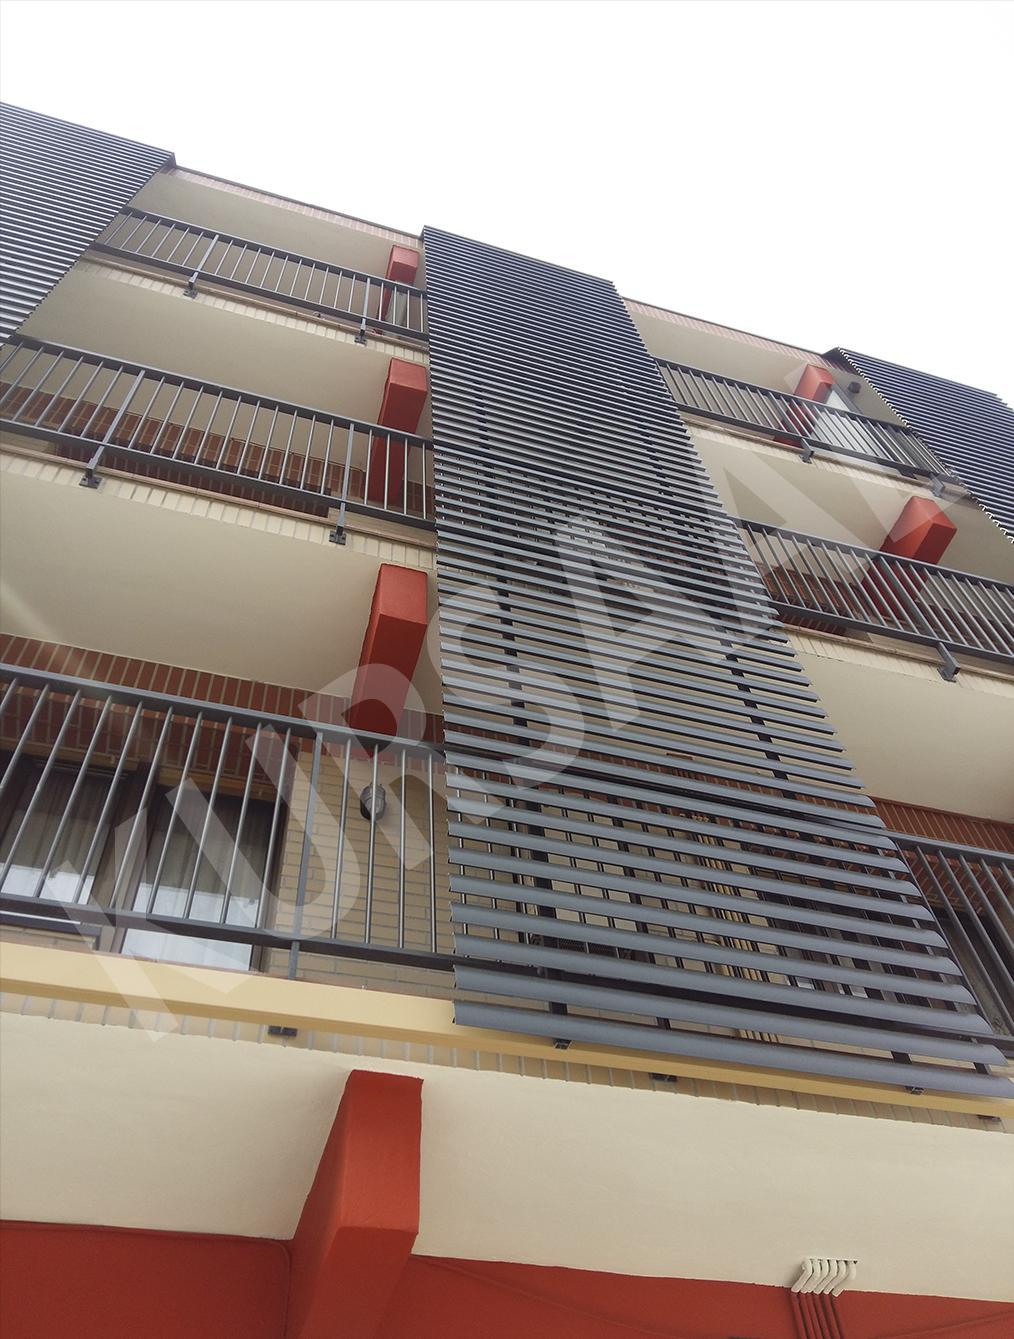 foto 9 - Aislamientos Térmicos y Eficiencia Energética-Paseo de Herrera 5-7-DONOSTIA, GIPUZKOA